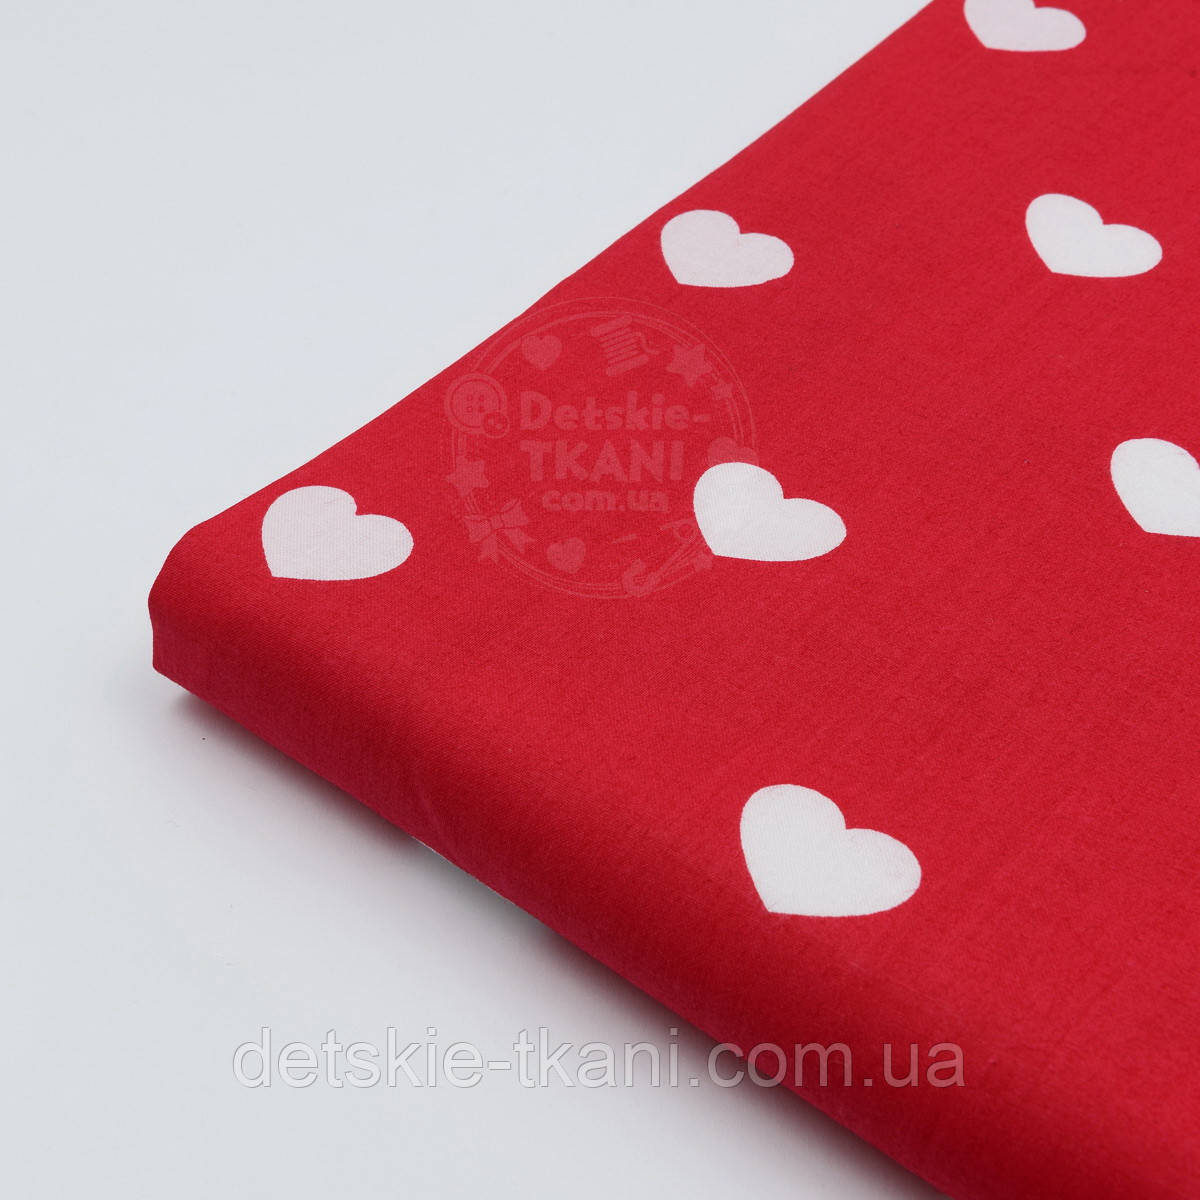 Лоскут ткани №400а с белыми сердечками на красном фоне